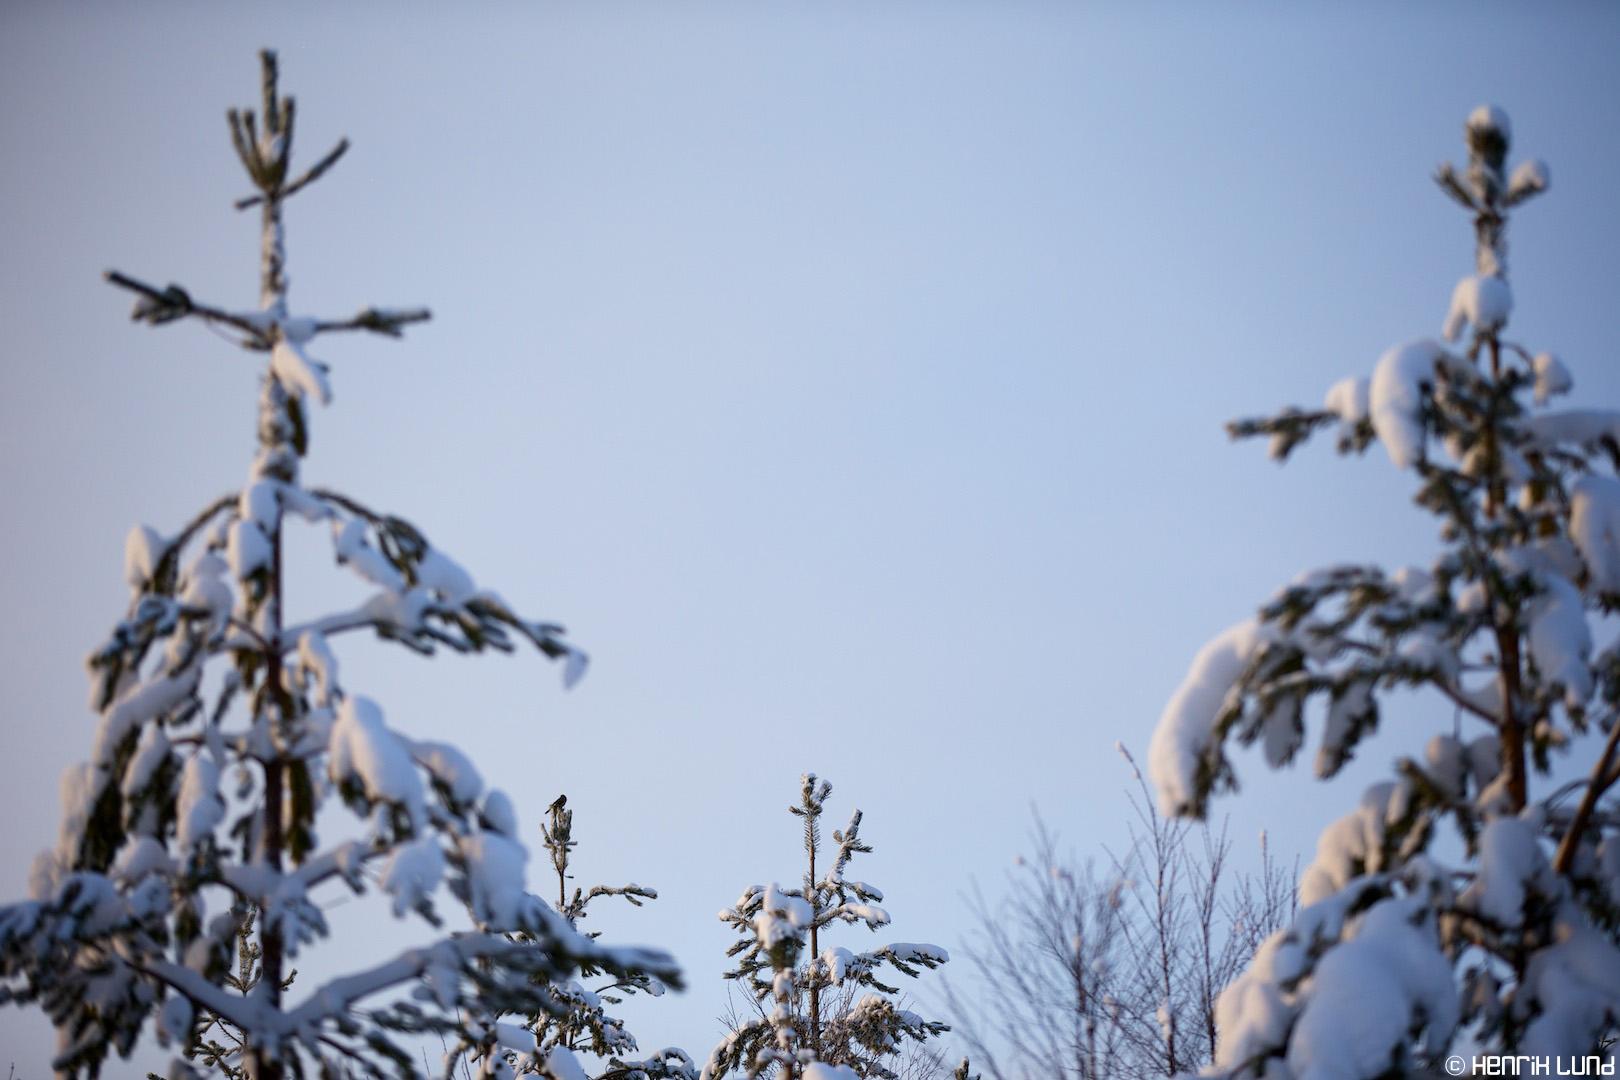 Perisoreus infaustus - Siberian jay, Ruka, Kuusamo, Finland, February 2014.